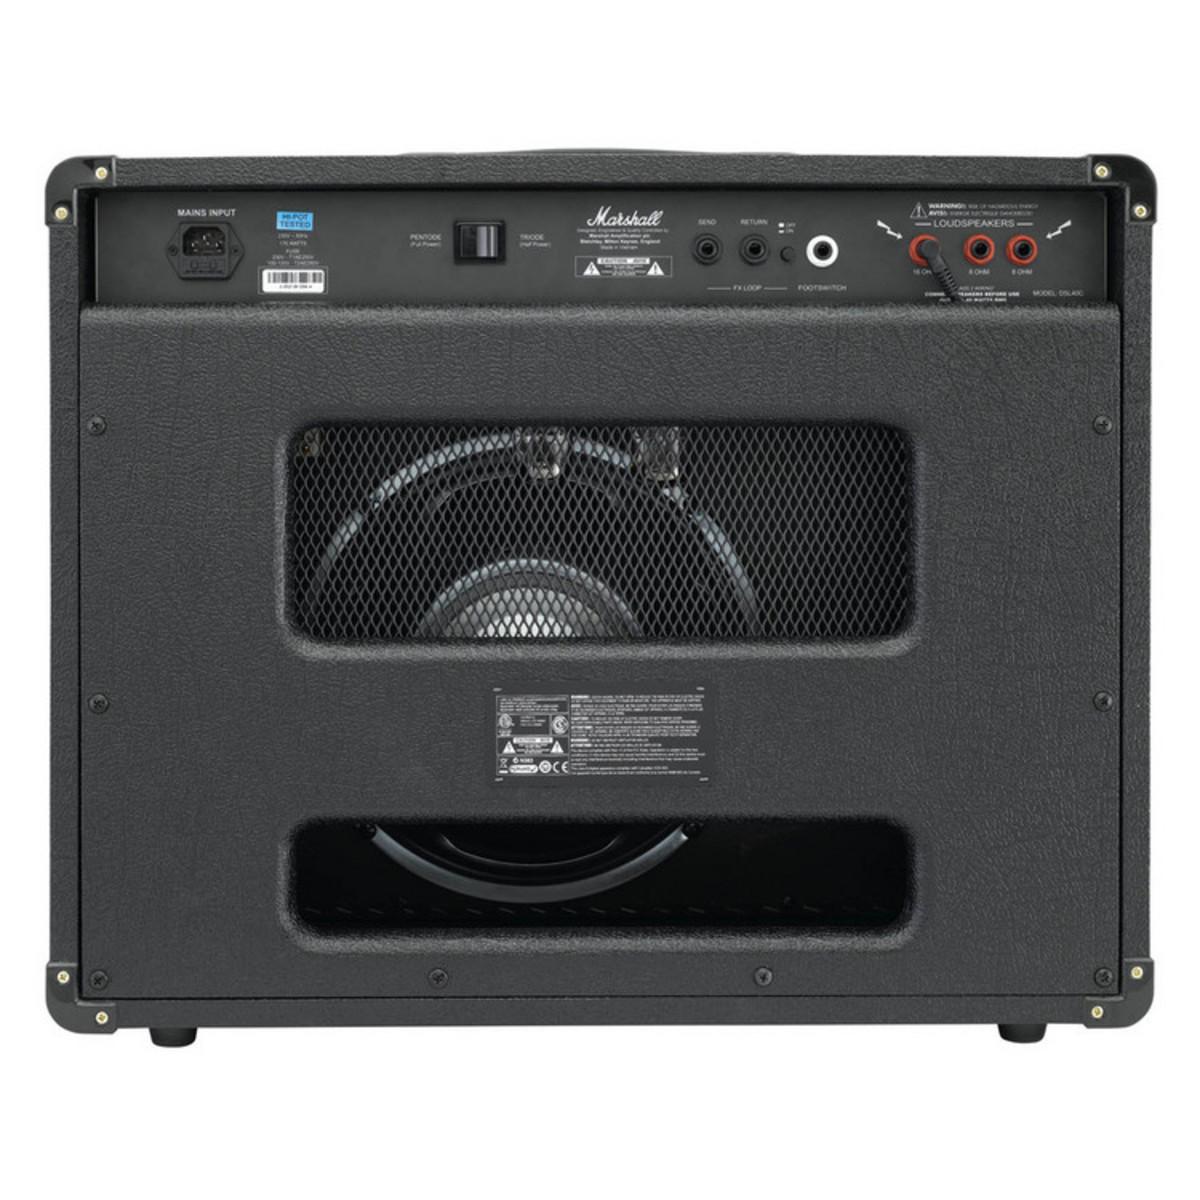 marshall dsl40c dsl series 40w guitar combo amp at gear4music. Black Bedroom Furniture Sets. Home Design Ideas